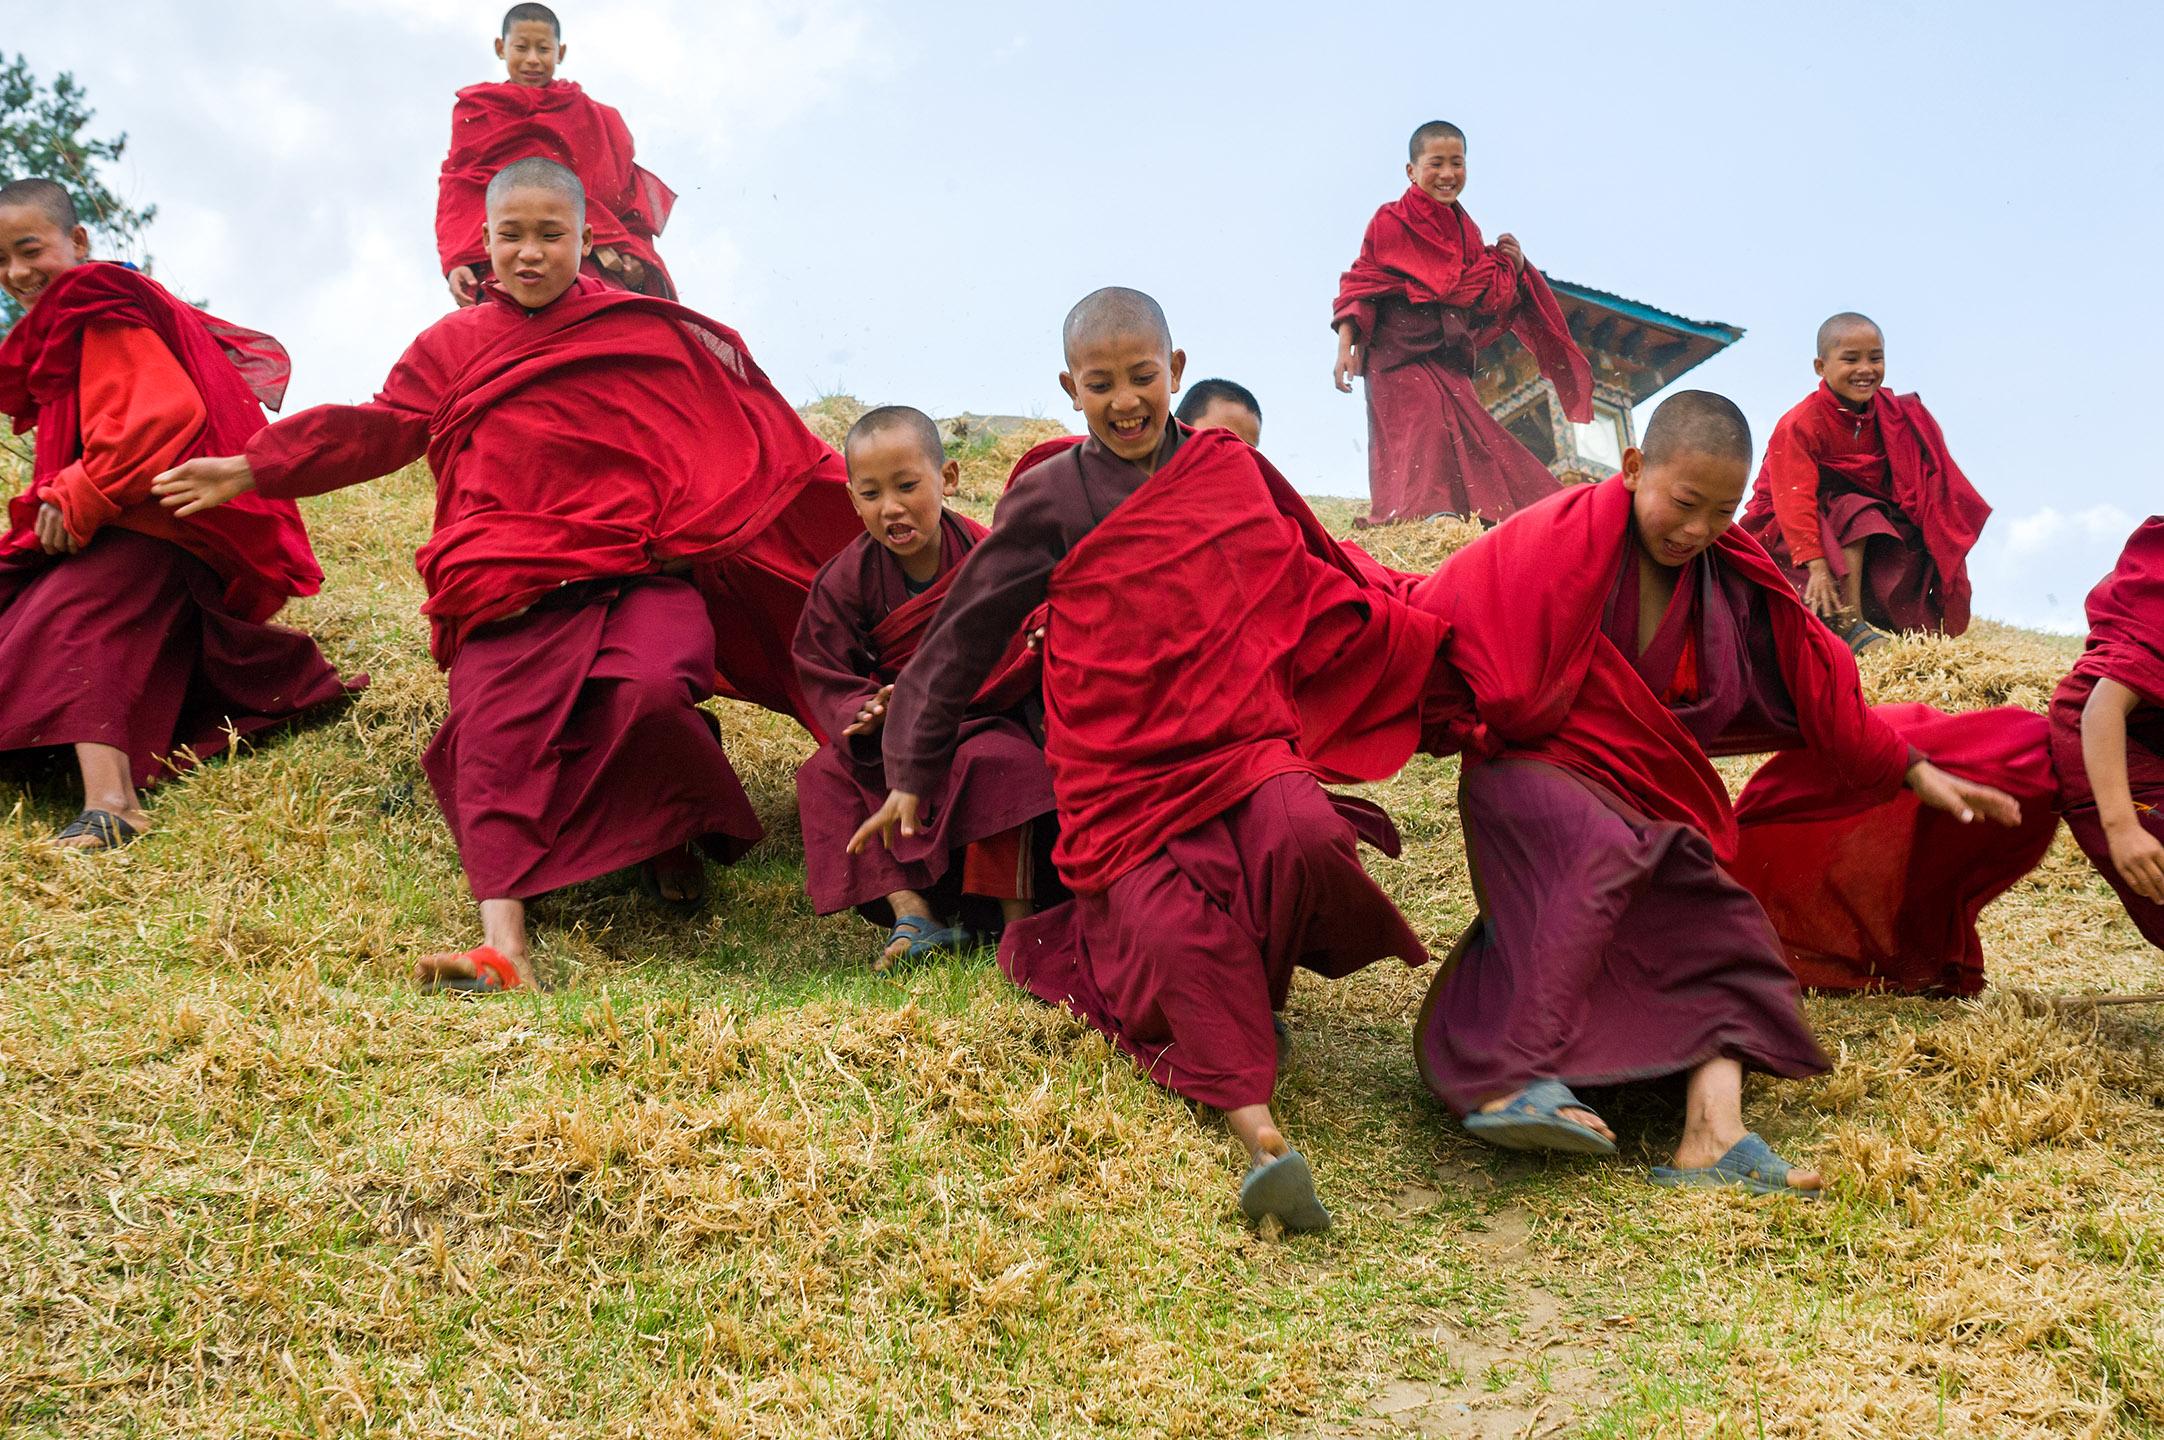 SCOTT A WOODWARD_DSC4737 (Dechen Phodrang Monastery, Thimphu)